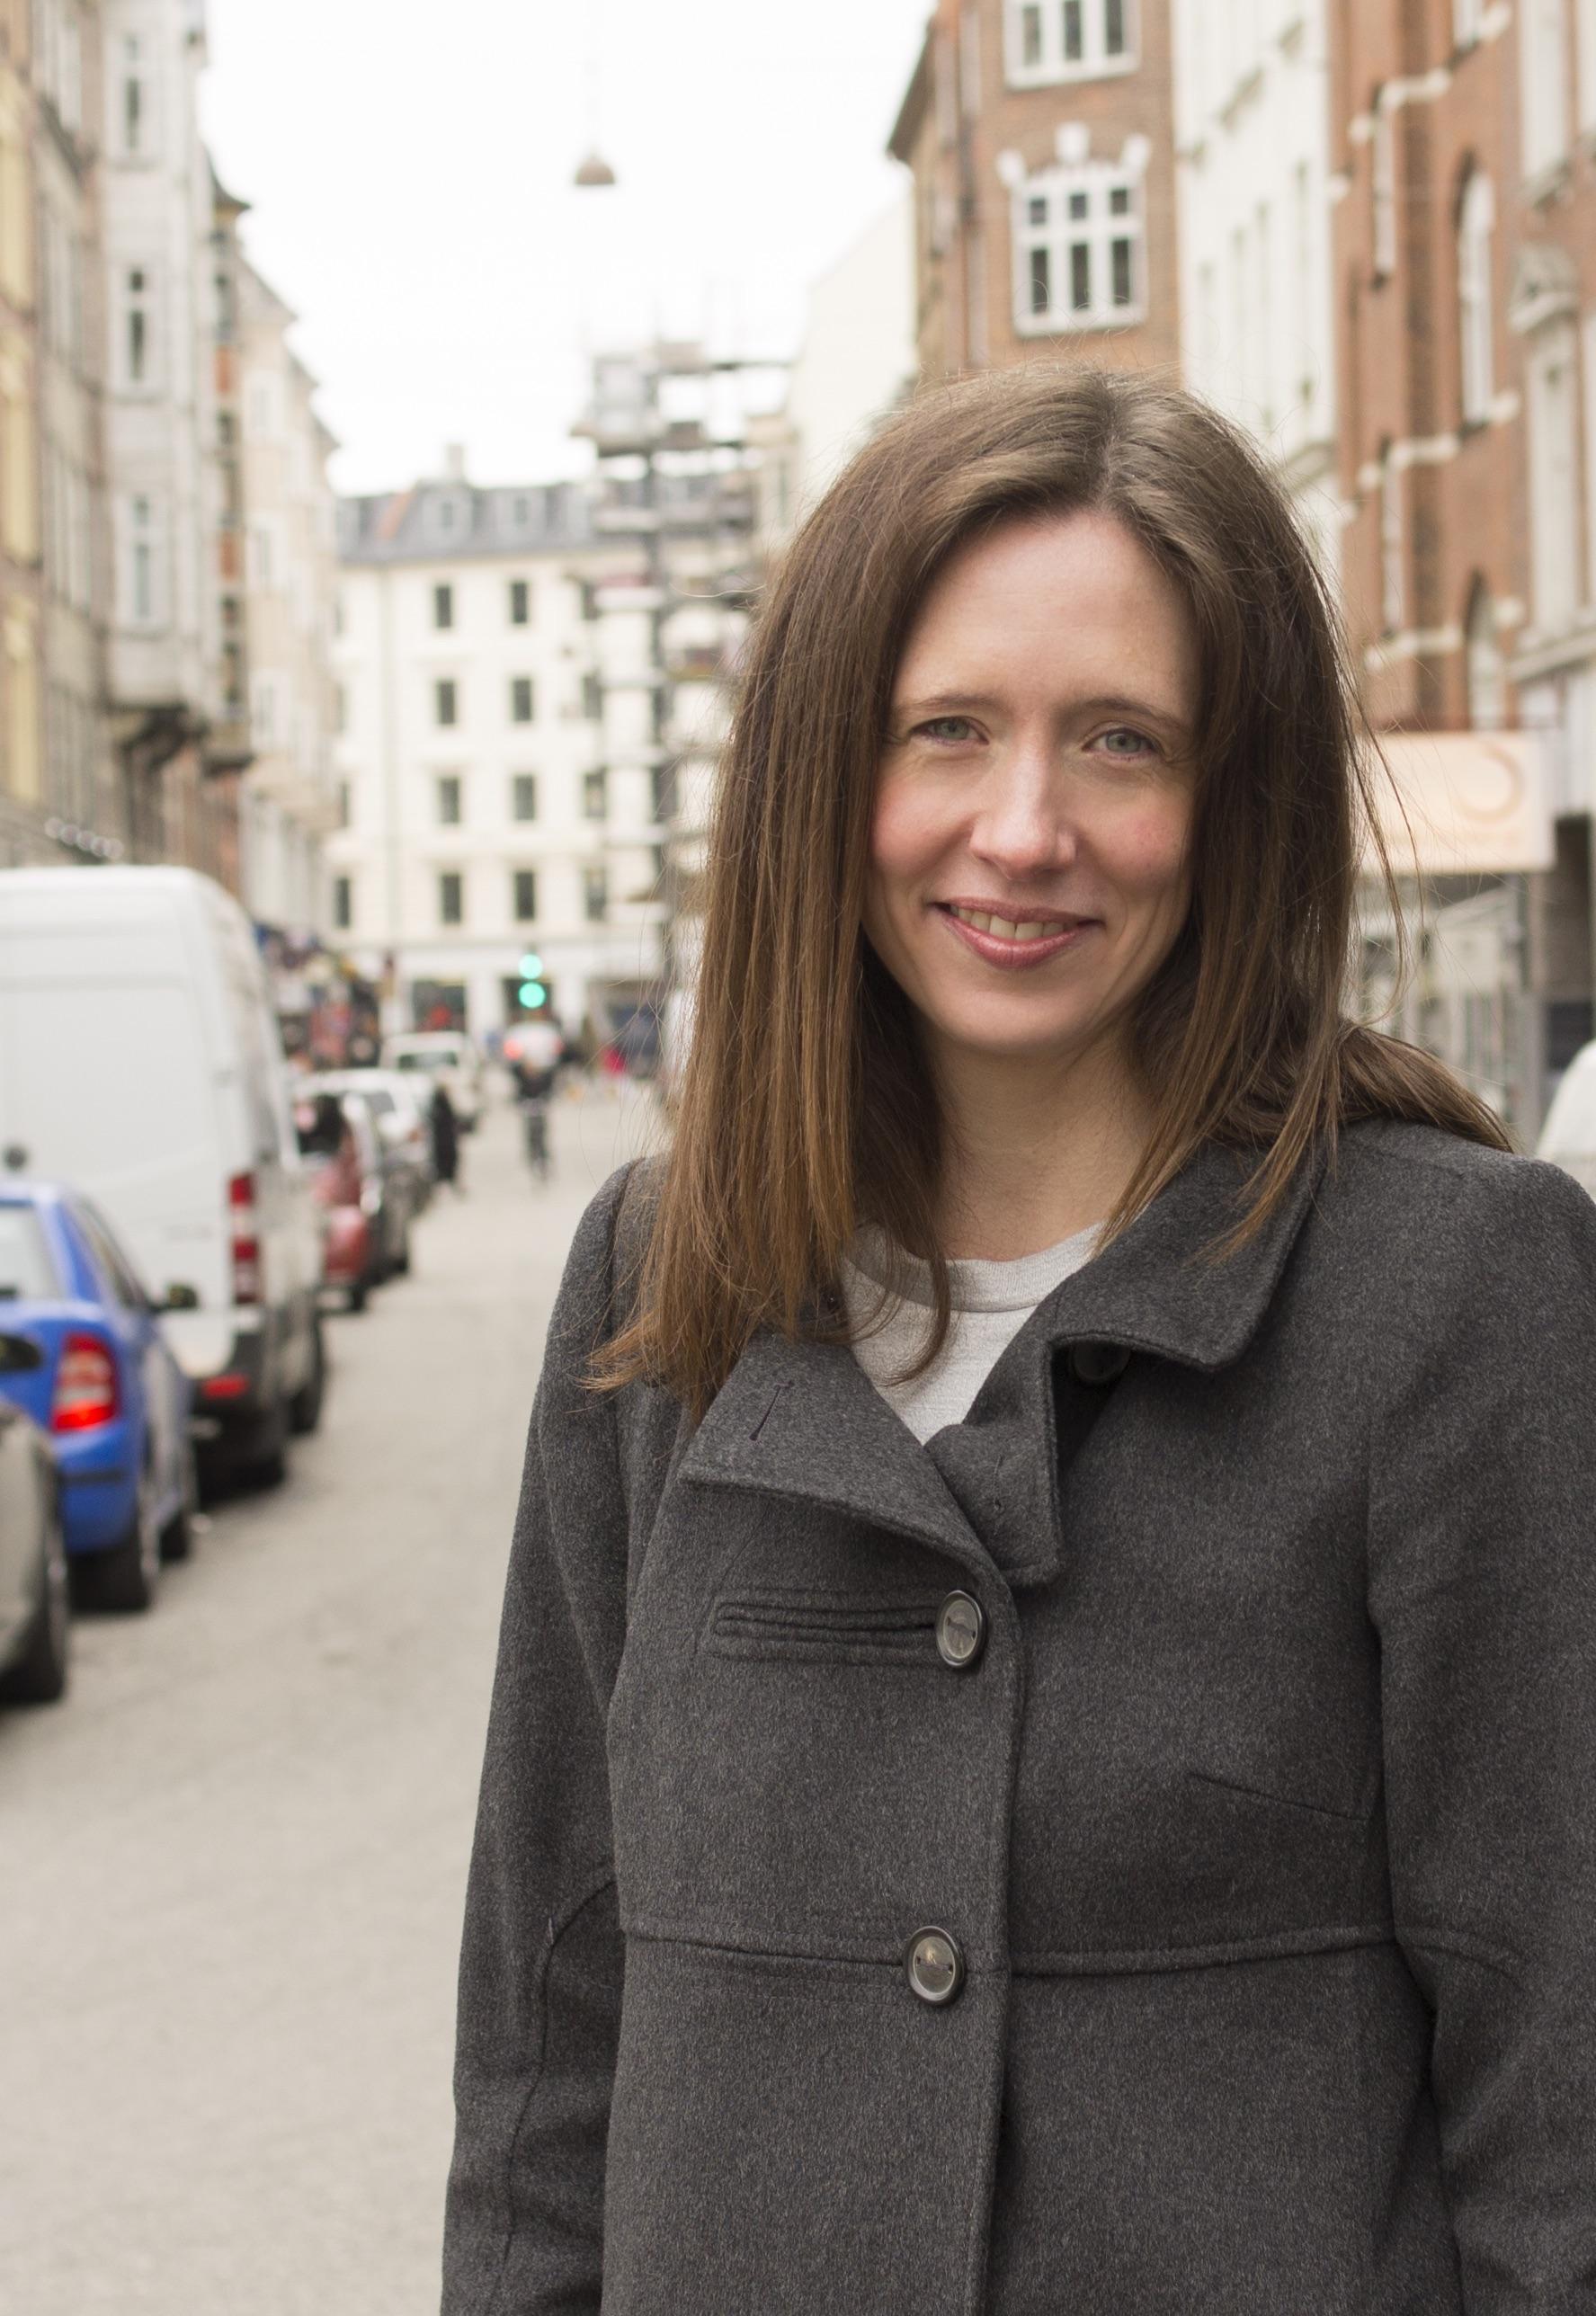 Louise Vogel Kielgast - associate at GEHL Architects